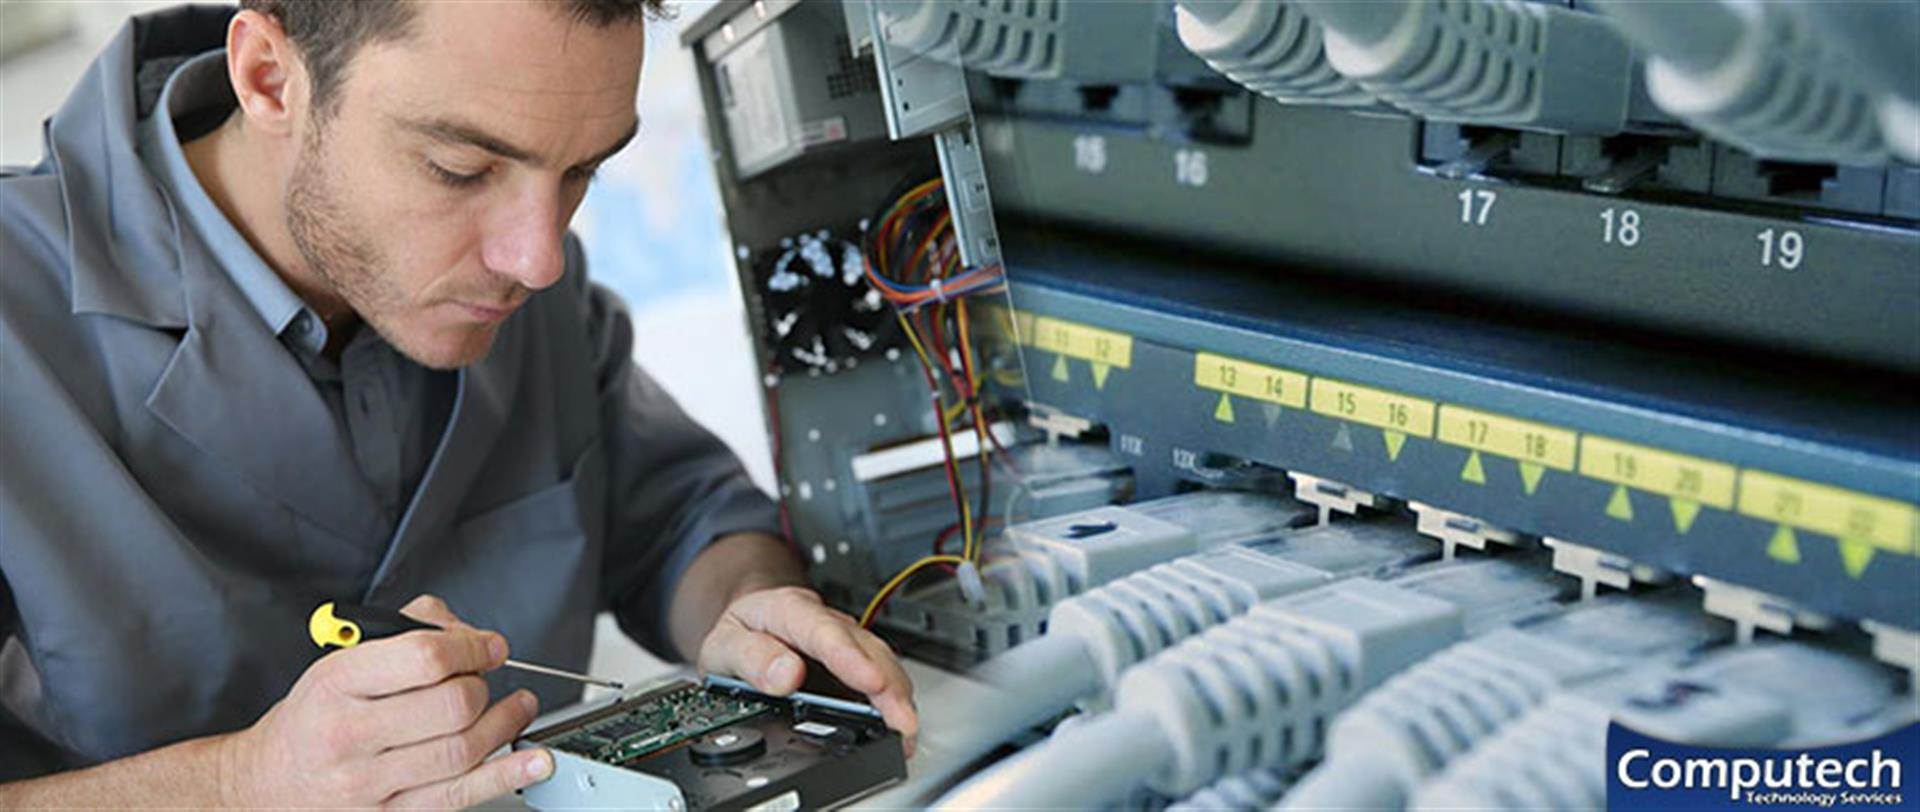 Swainsboro Georgia On Site Computer & Printer Repair, Networking, Voice & Data Cabling Contractors